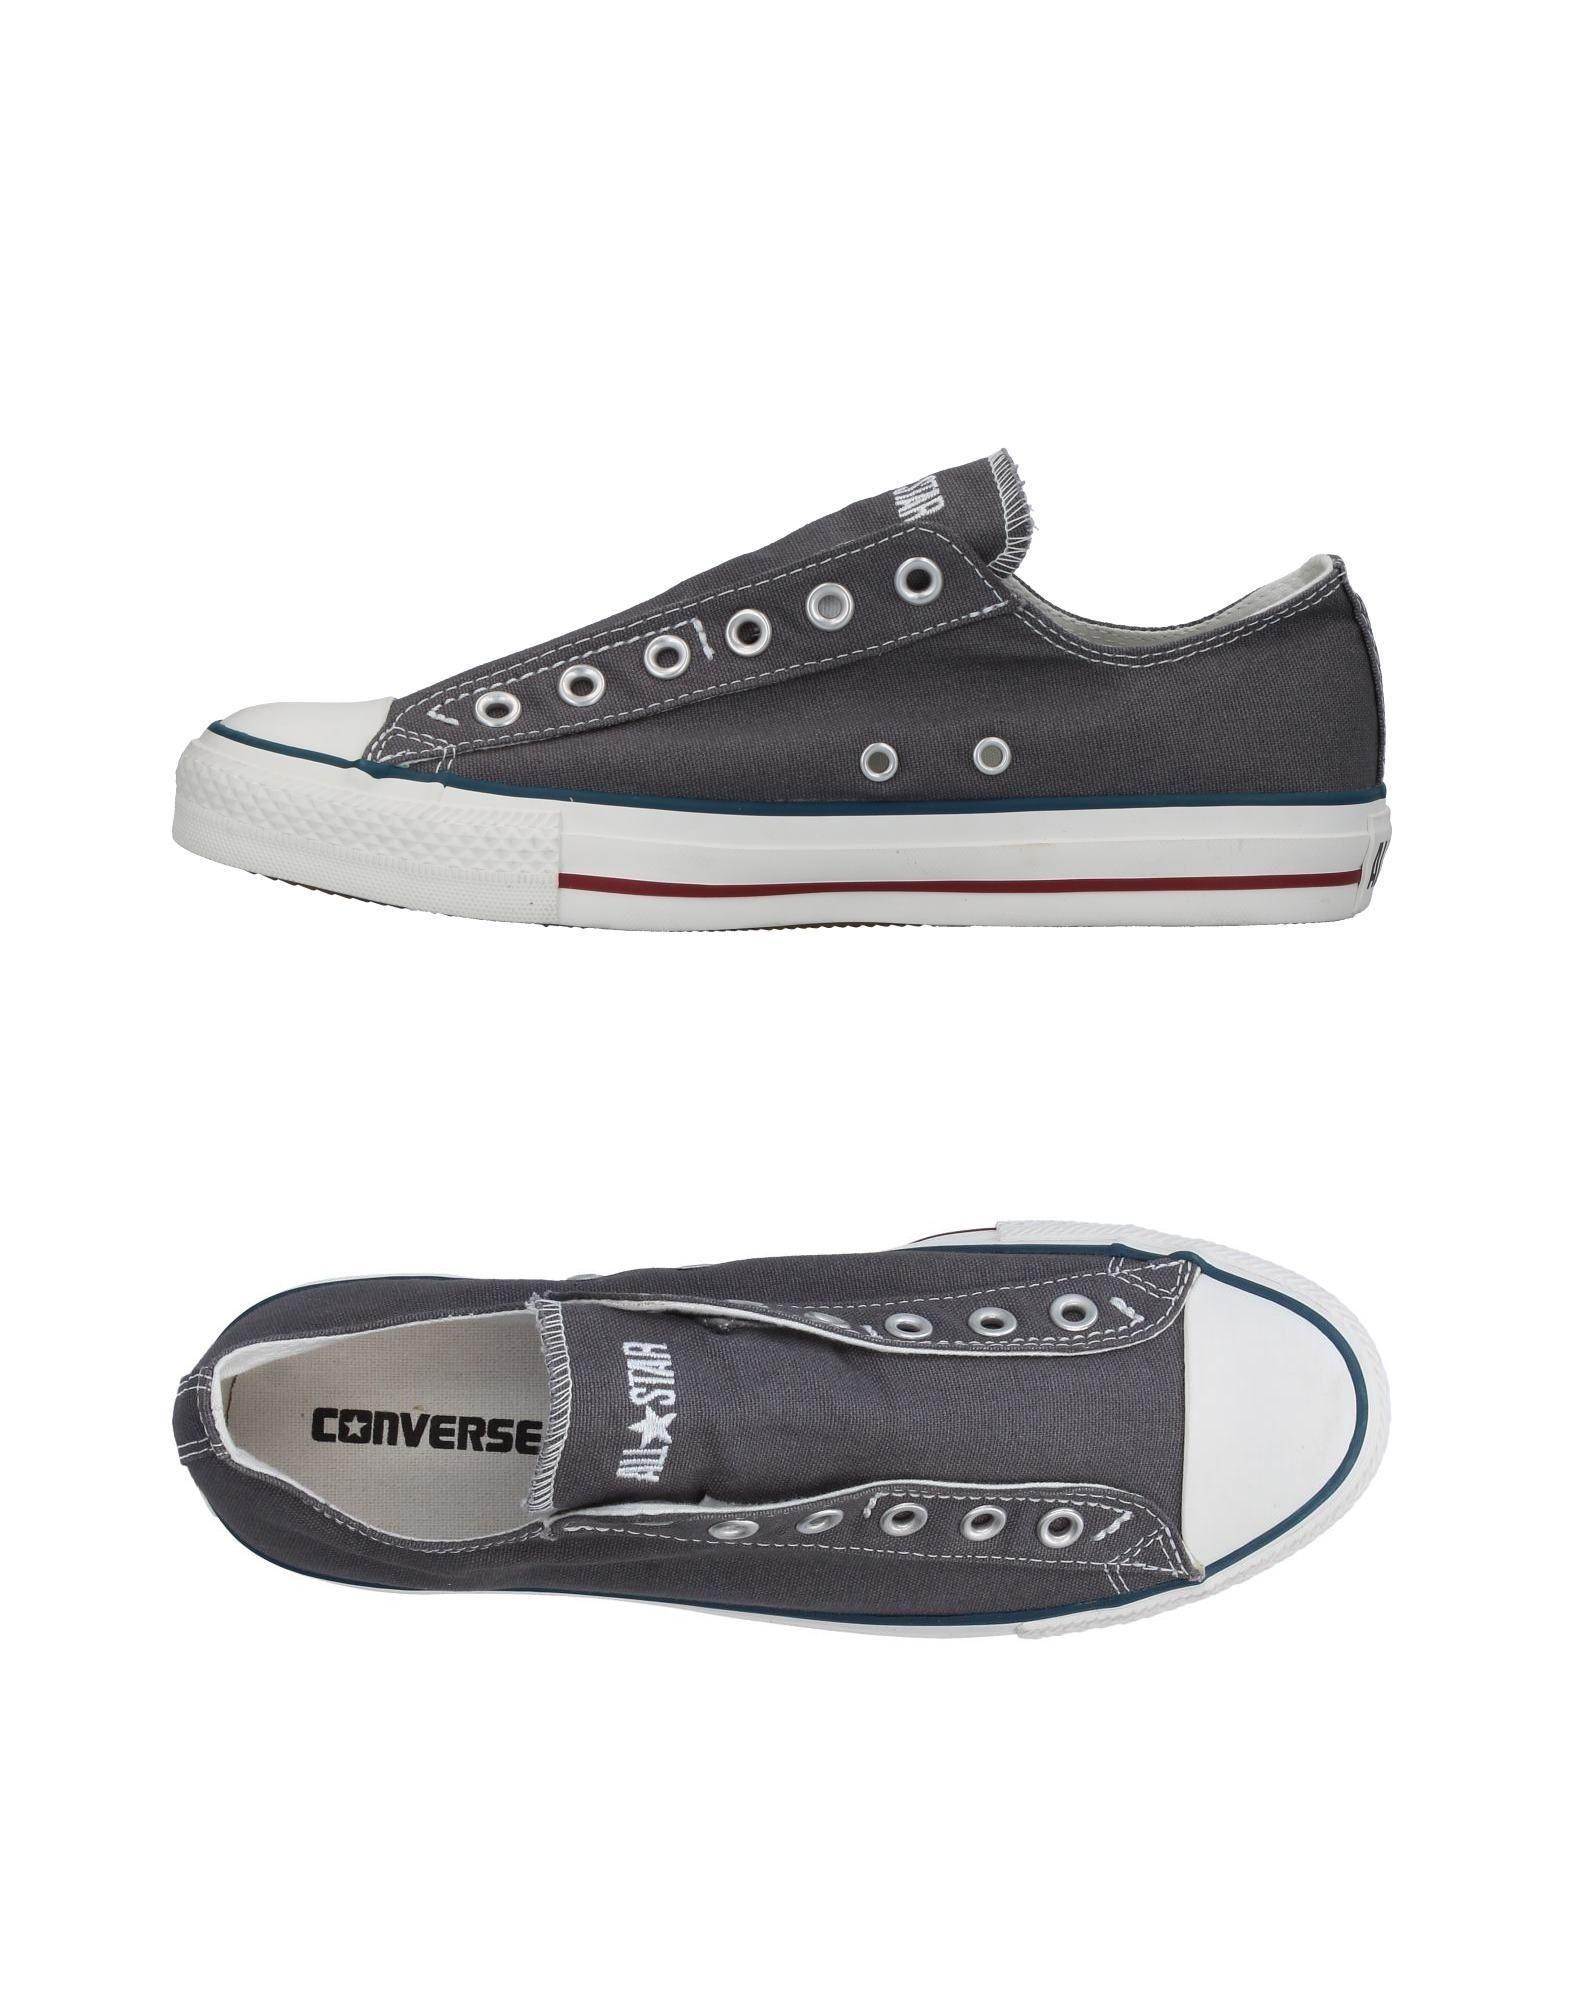 CONVERSE ALL STAR Herren Low Sneakers & Tennisschuhe Farbe Grau Größe 10